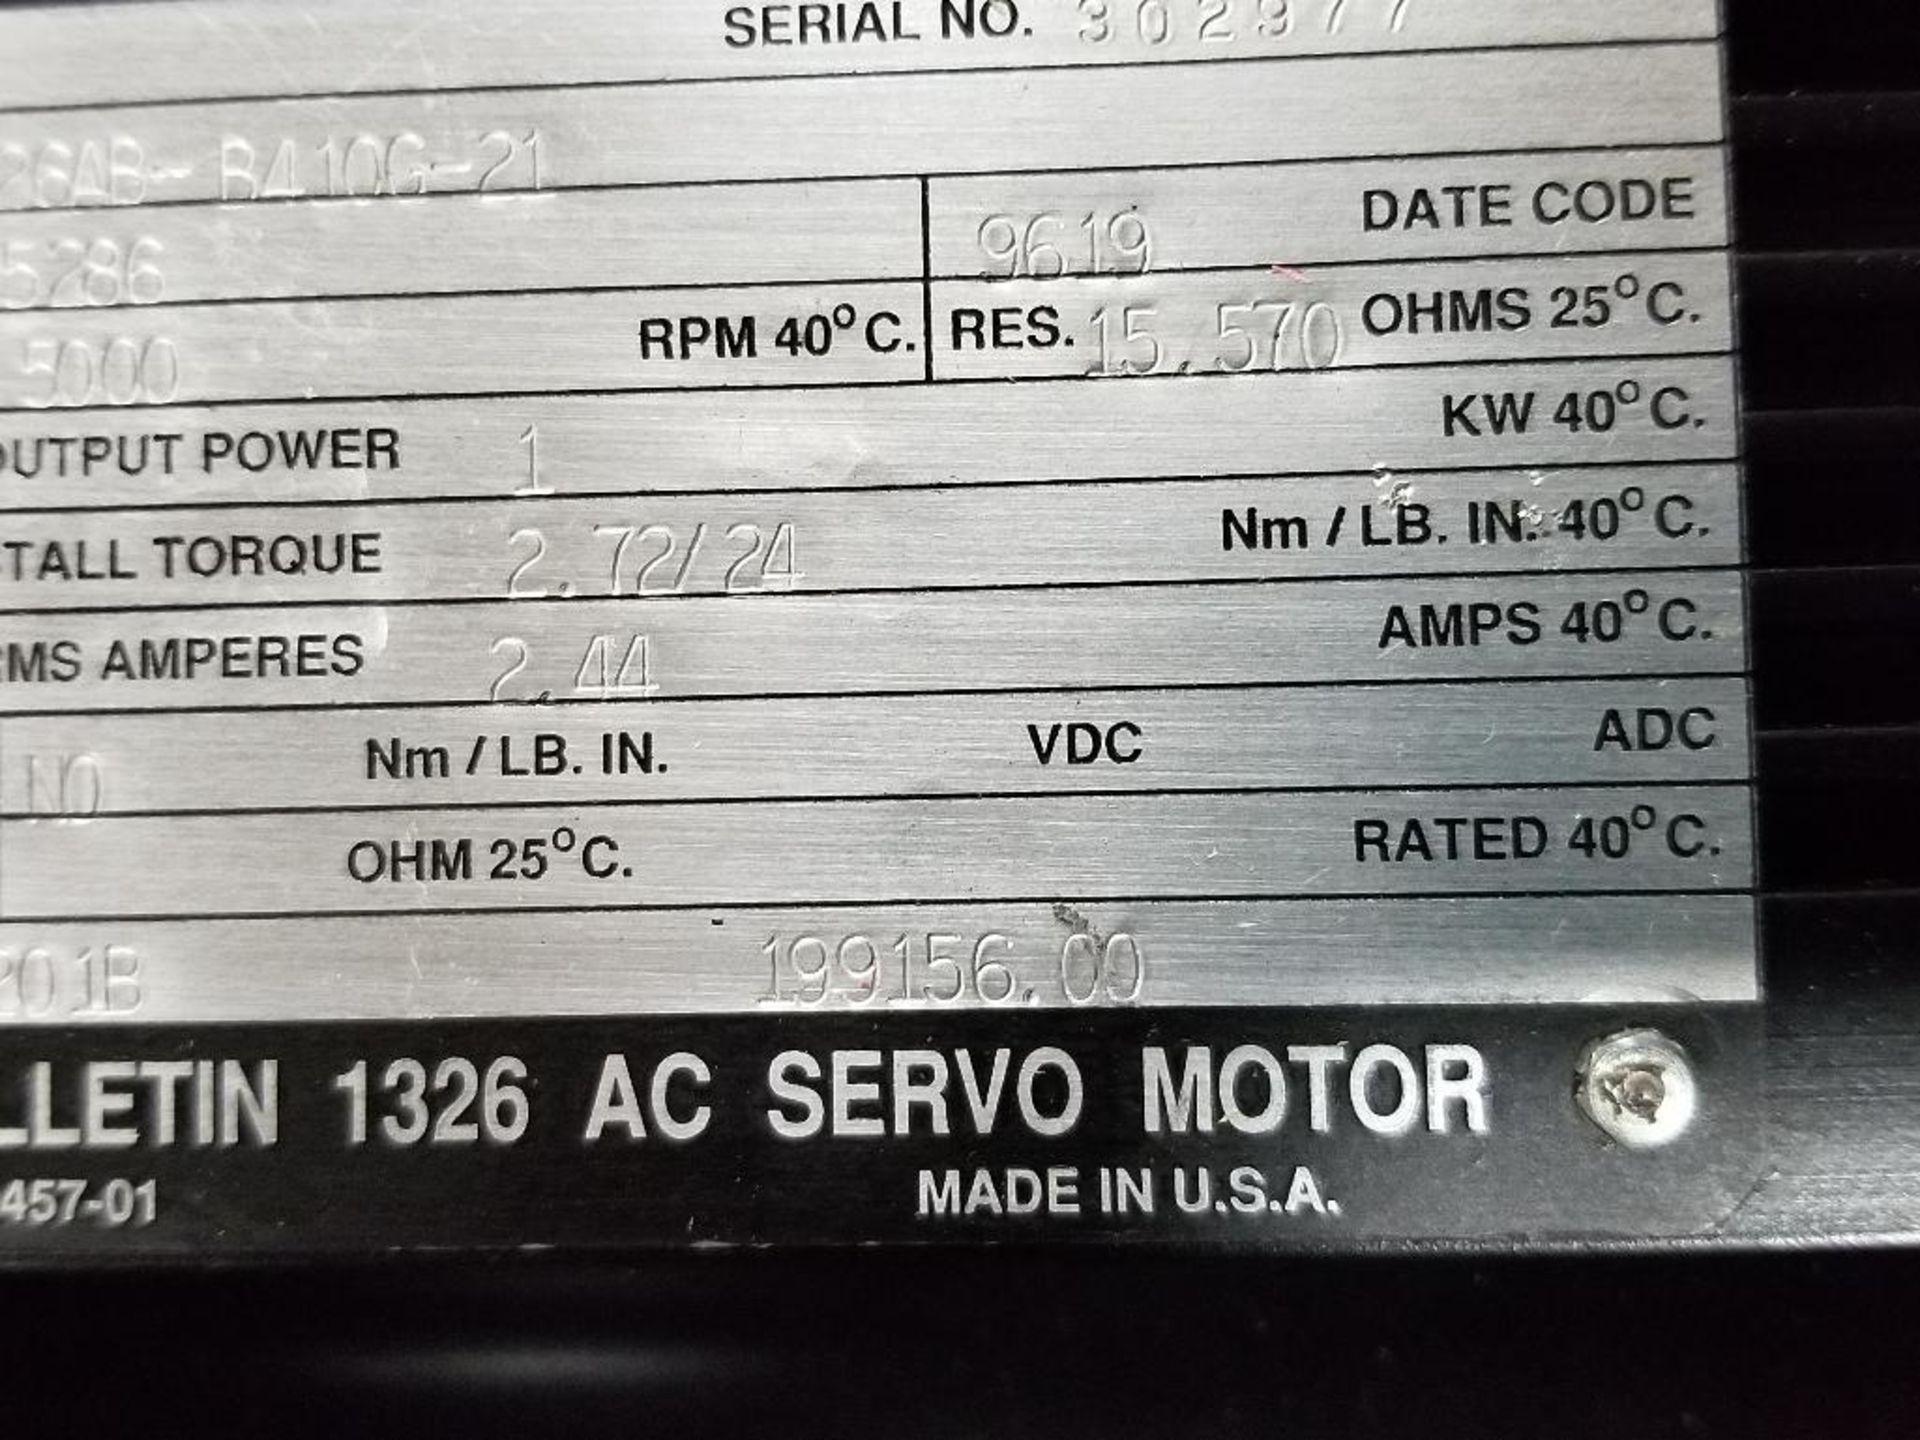 1kW Allen Bradley servo motor. Cat# 1326AB-B410G-21, Part# 155286, 5000RPM. - Image 5 of 6